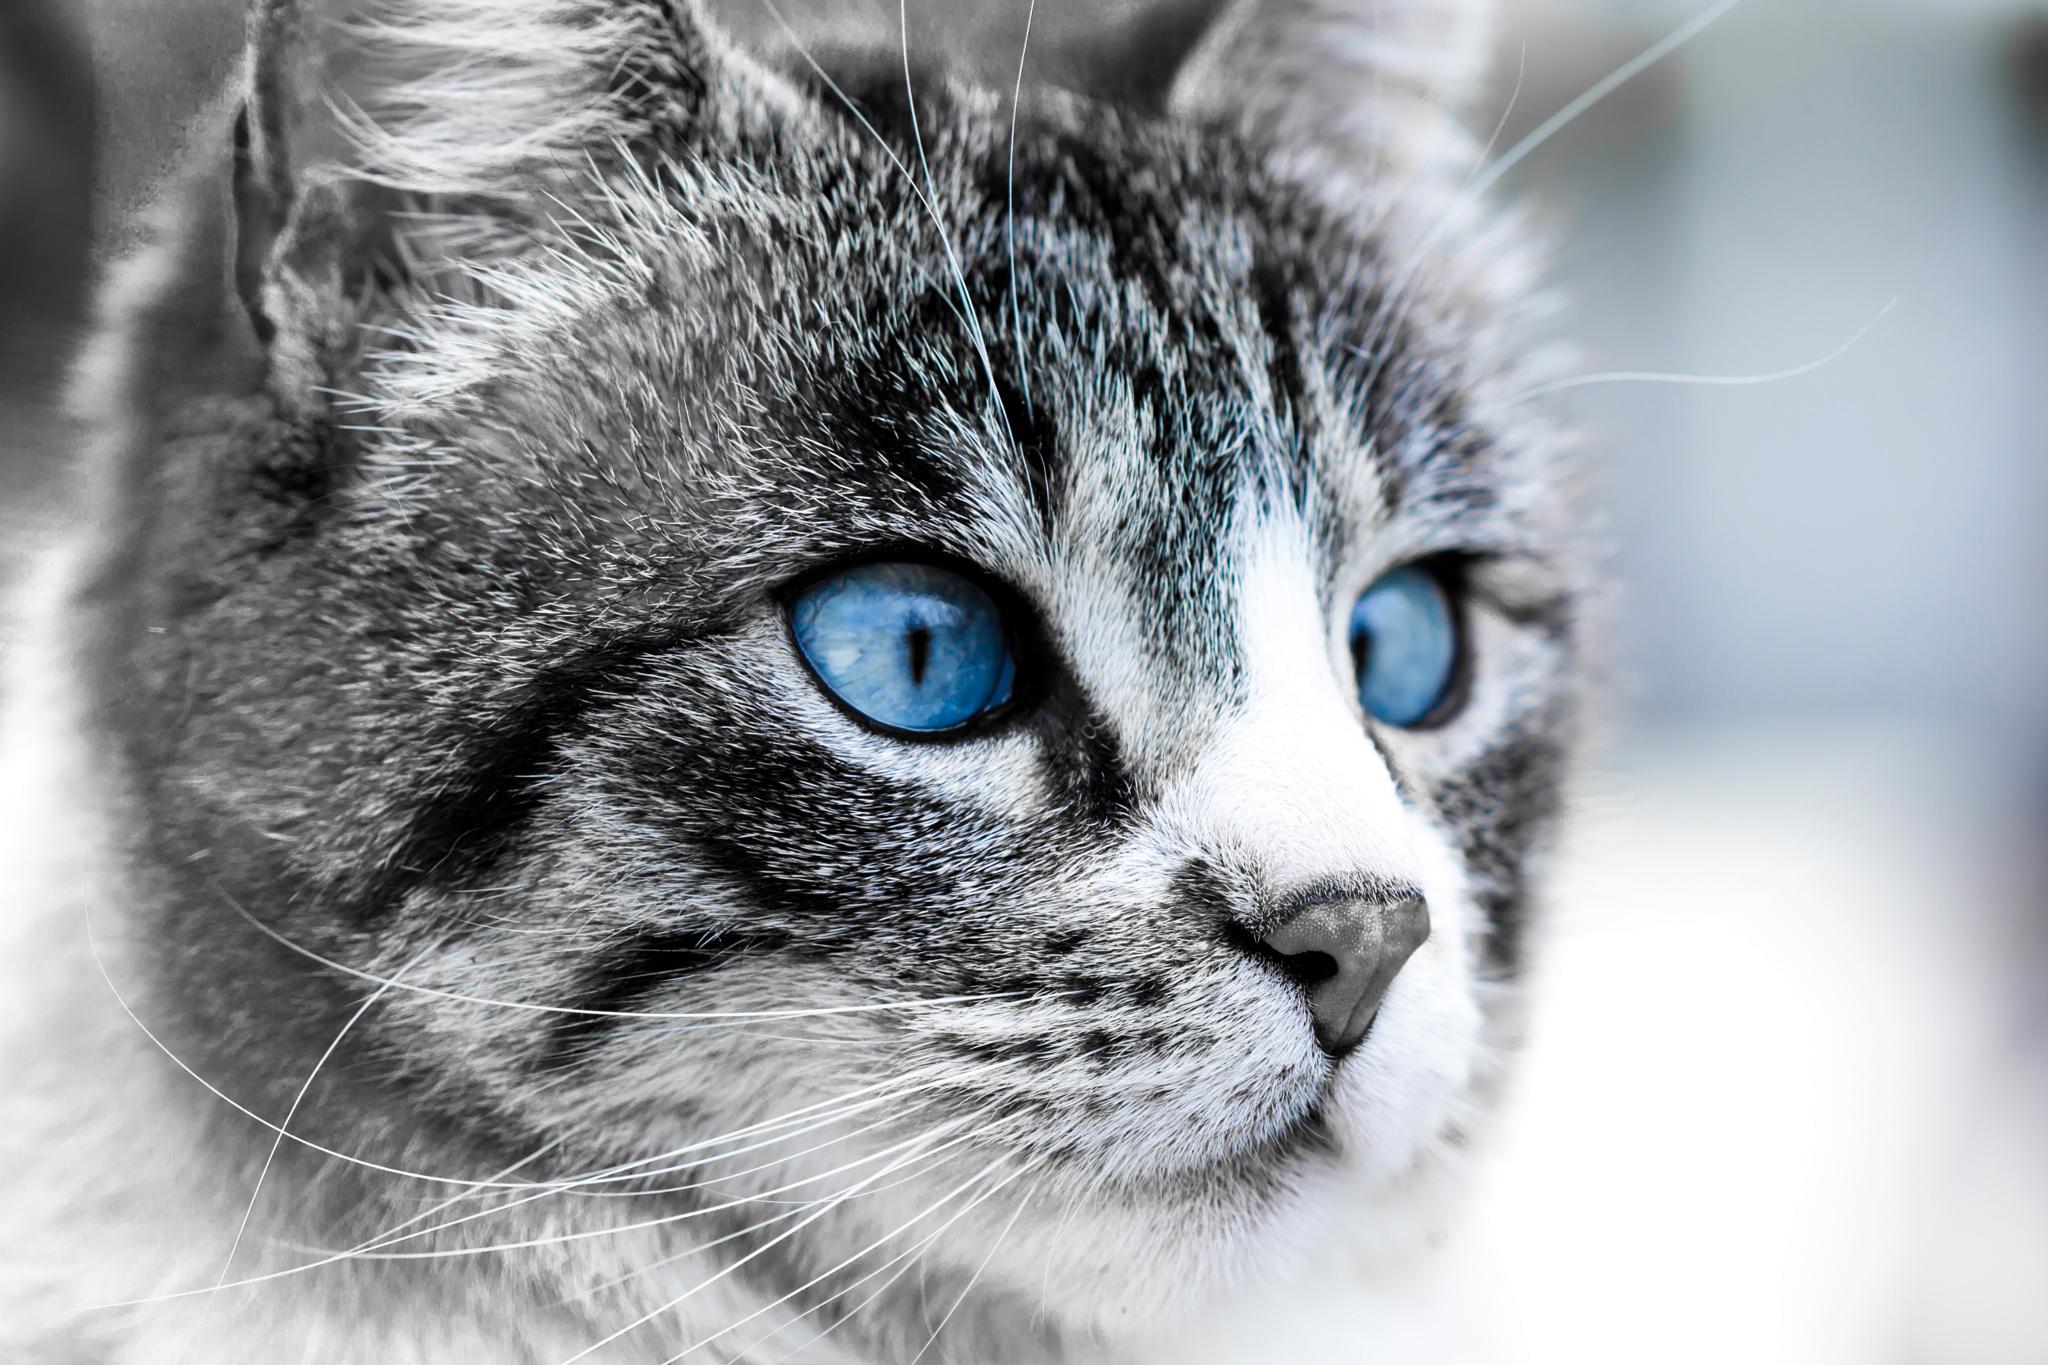 Гулубоглазый дымчатый котенок бесплатно